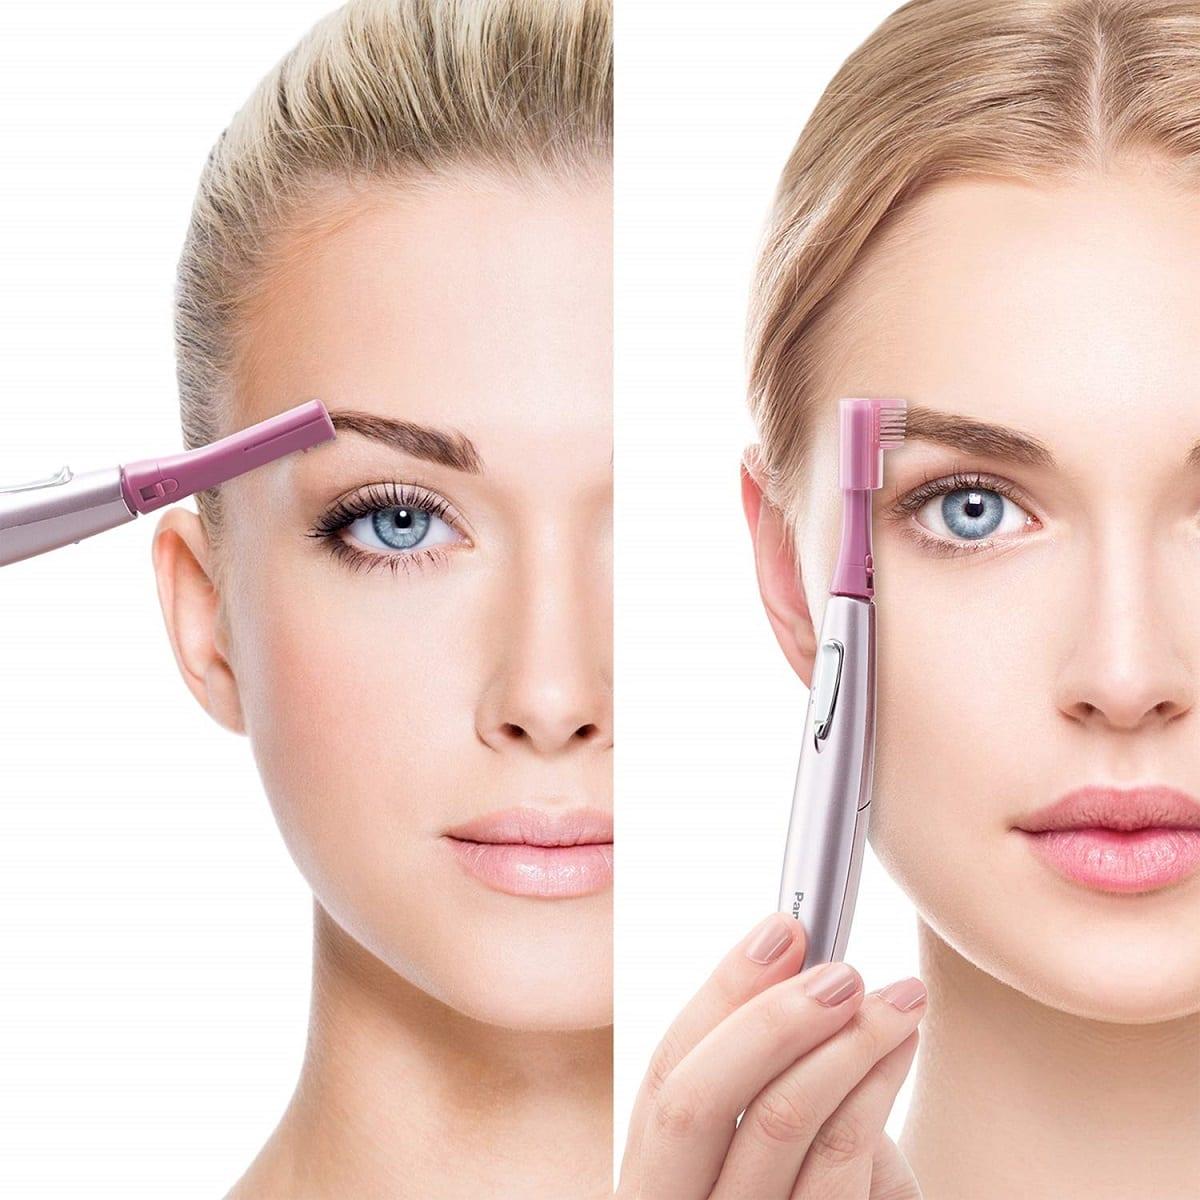 panasonic hair trimmer image